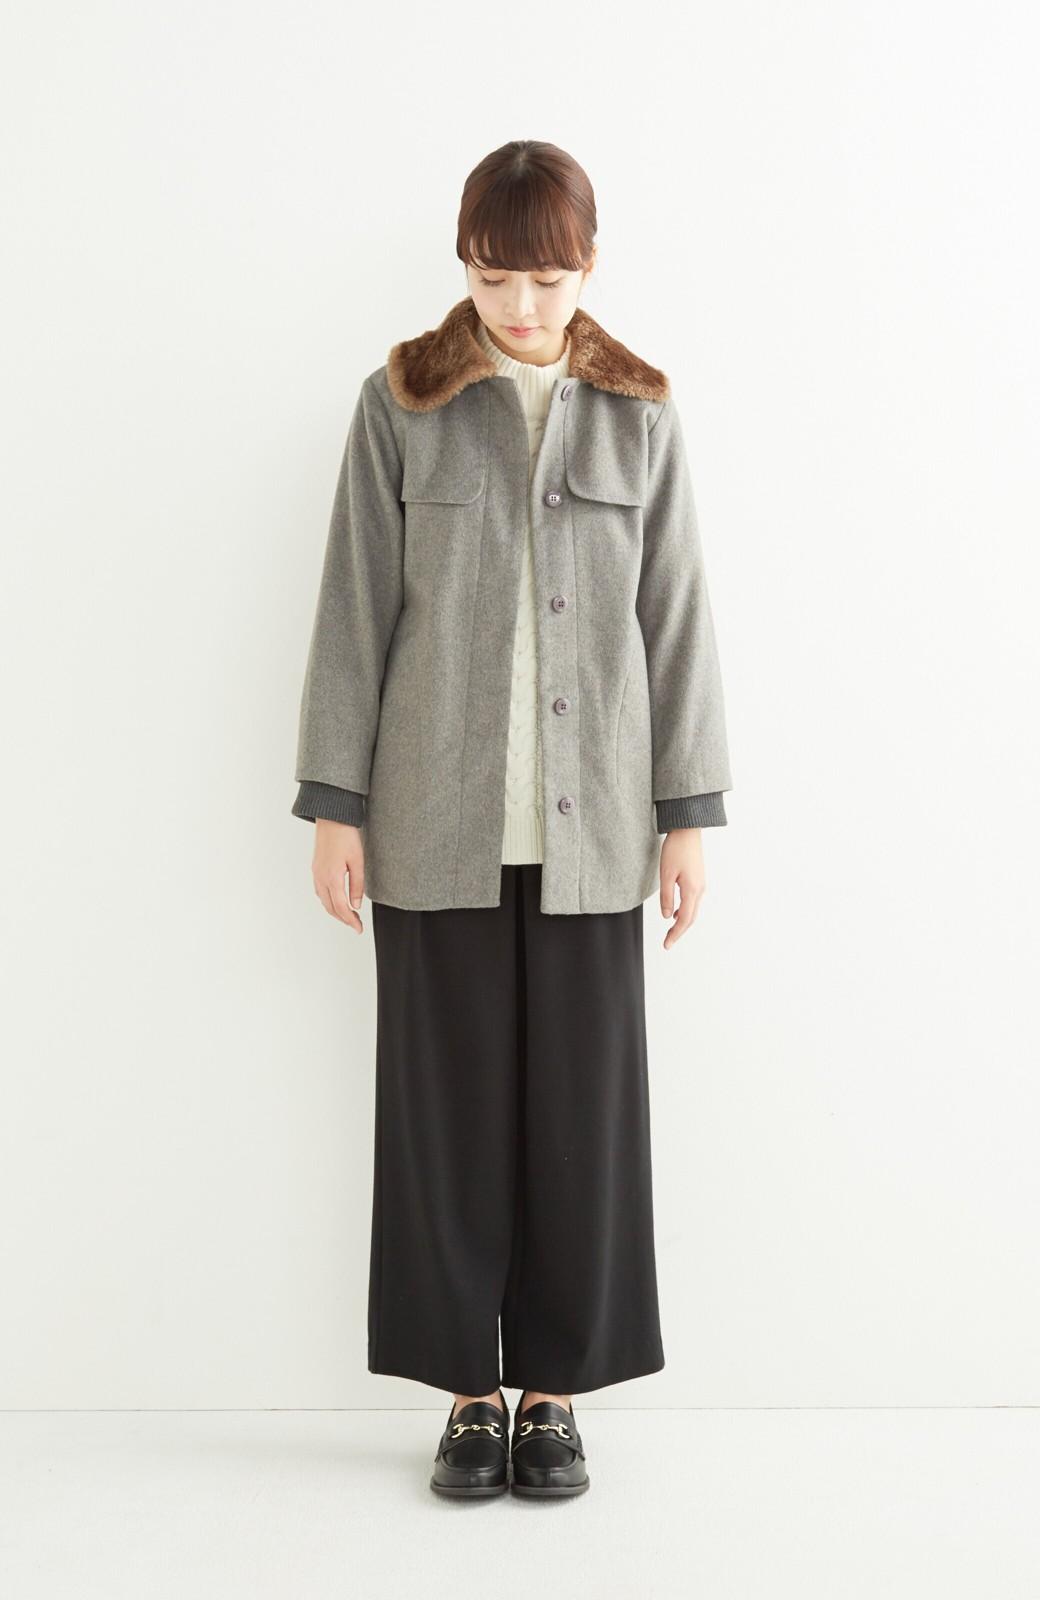 pilvee 取り外しフェイクファー衿付き ウール混のノーカラーコート <グレー>の商品写真7